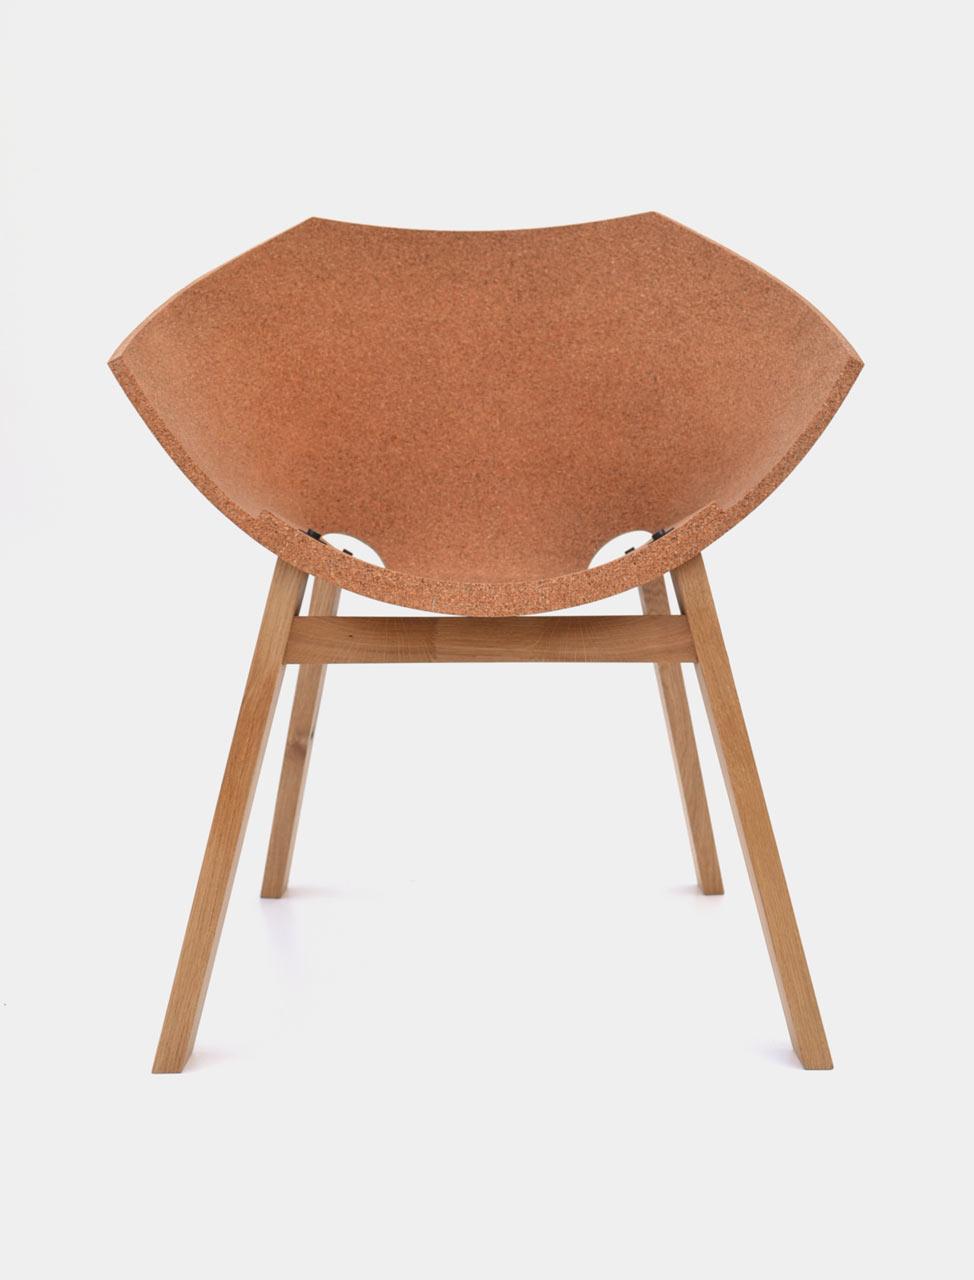 Corkigami-Chair-Carlos-Ortega-Design-4